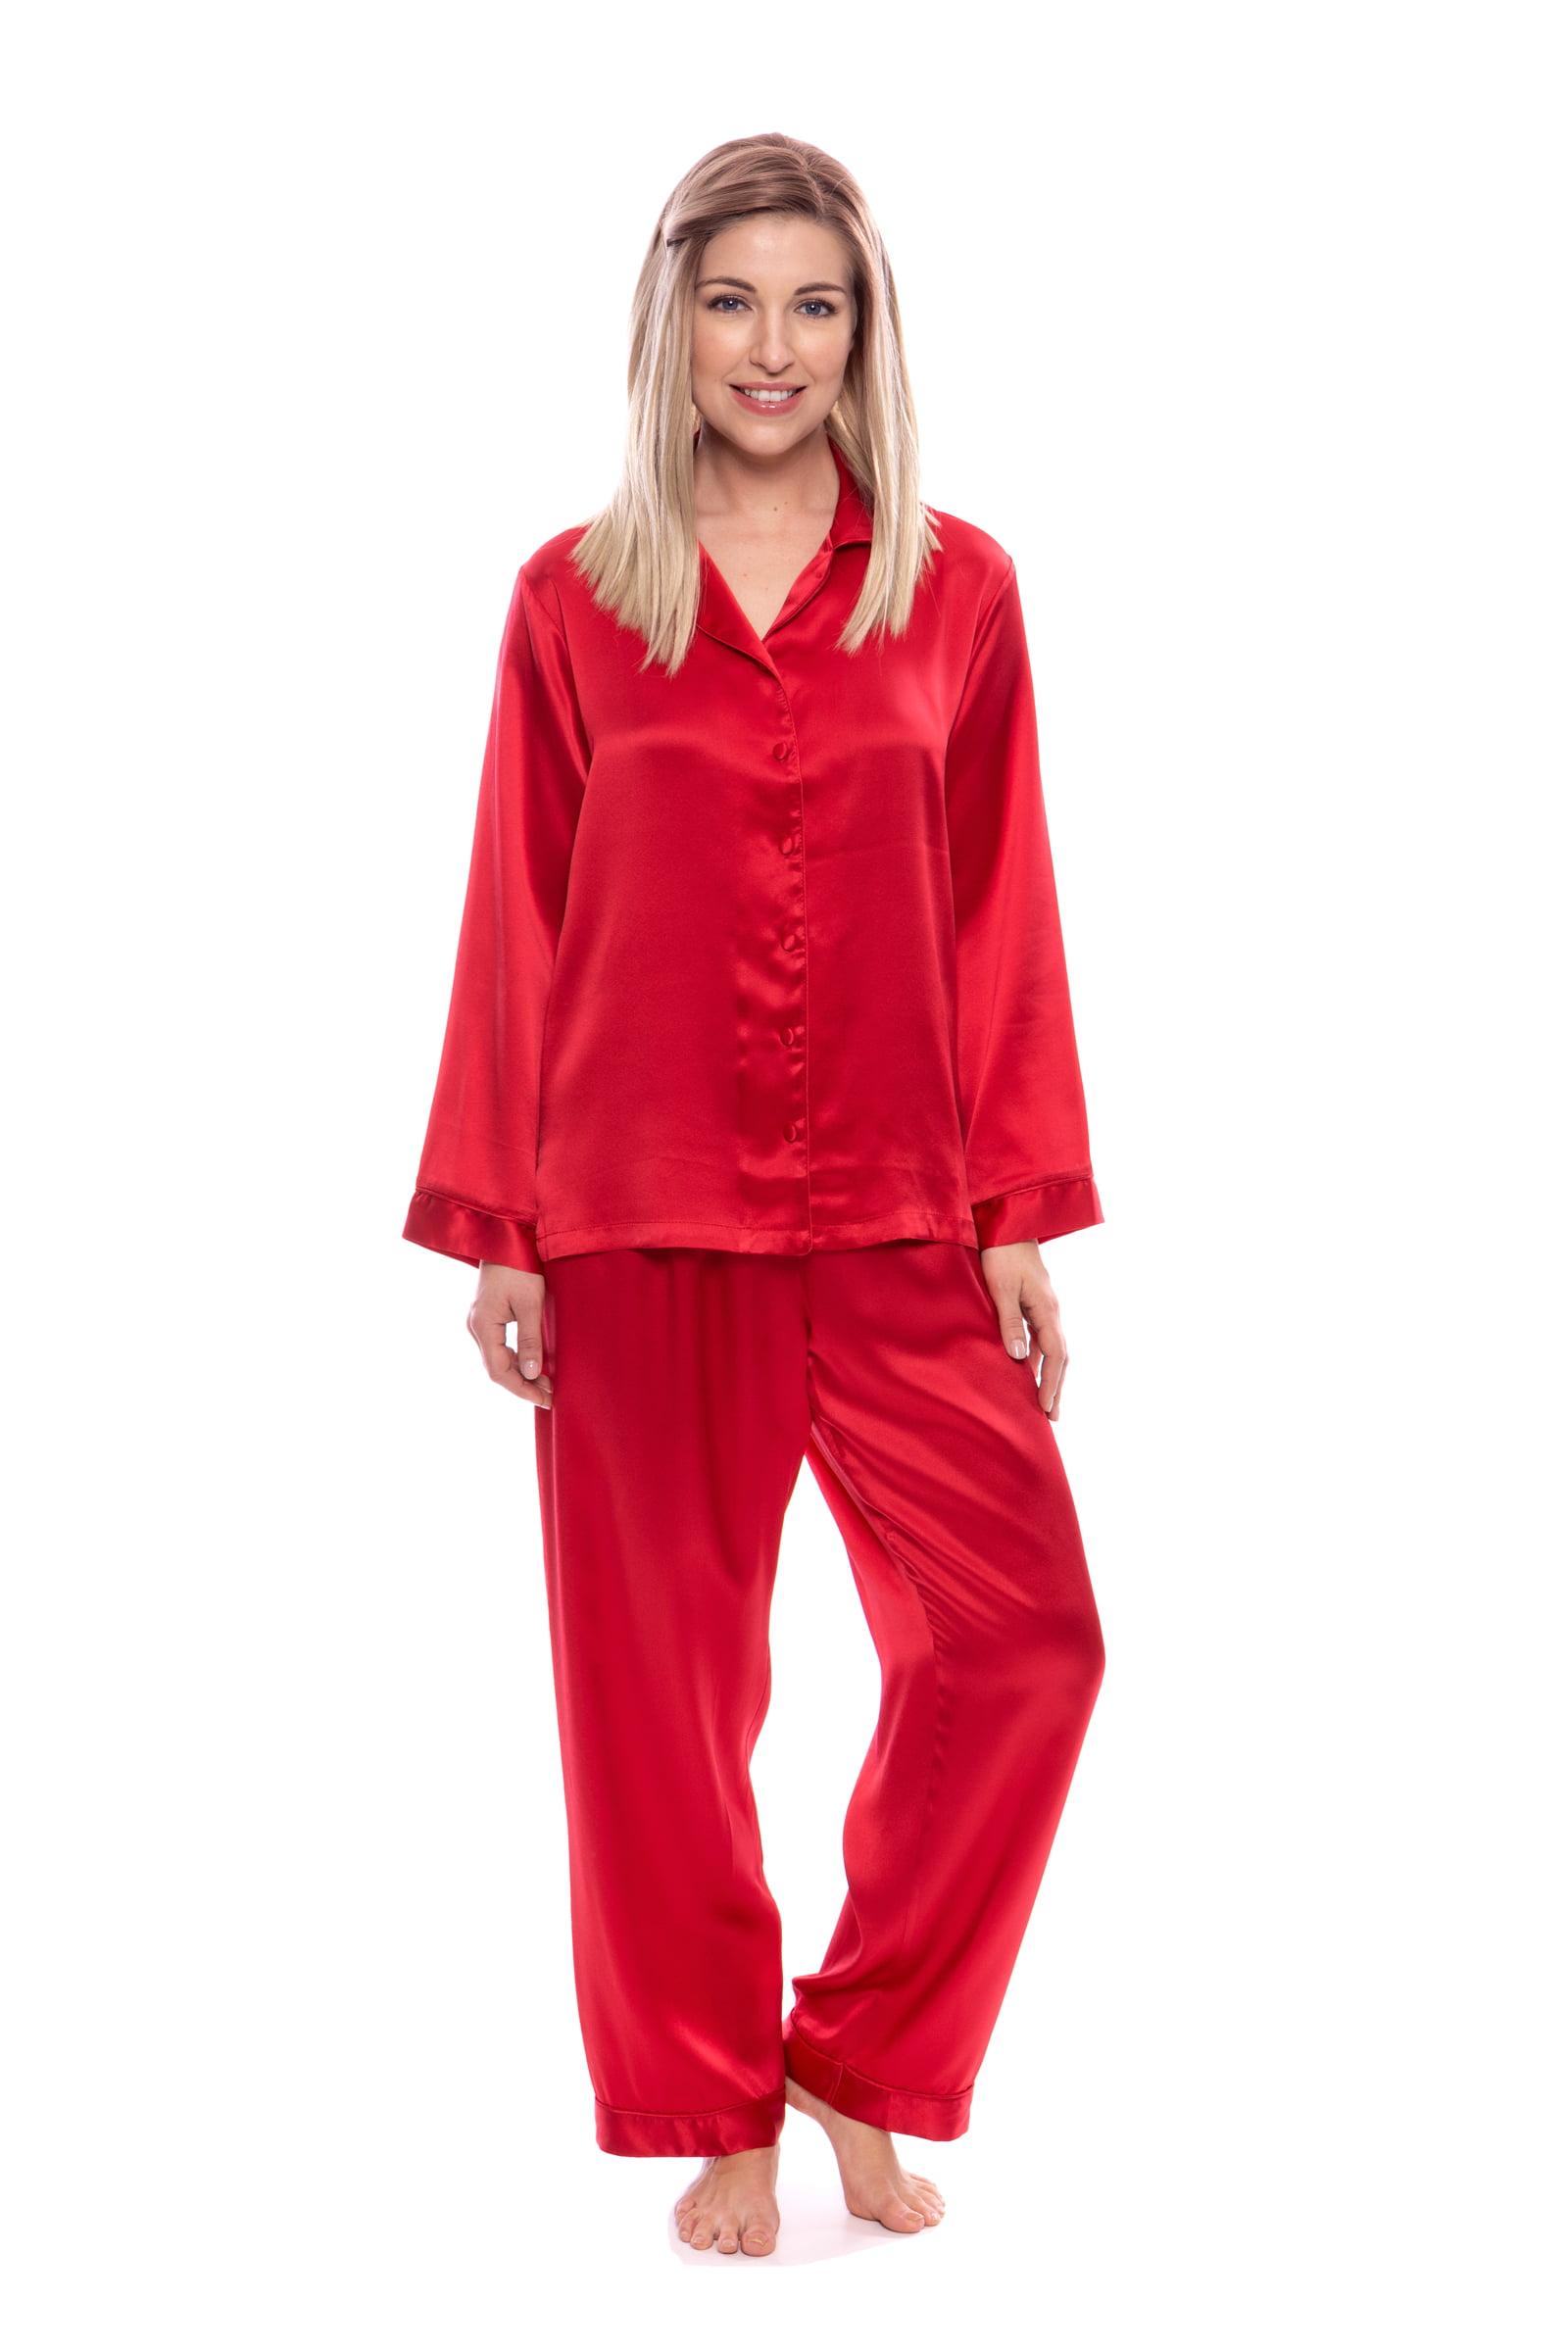 Women's 100% Silk Pajama Set - Luxury Sleepwear Pjs by TexereSilk (Morning Dew)